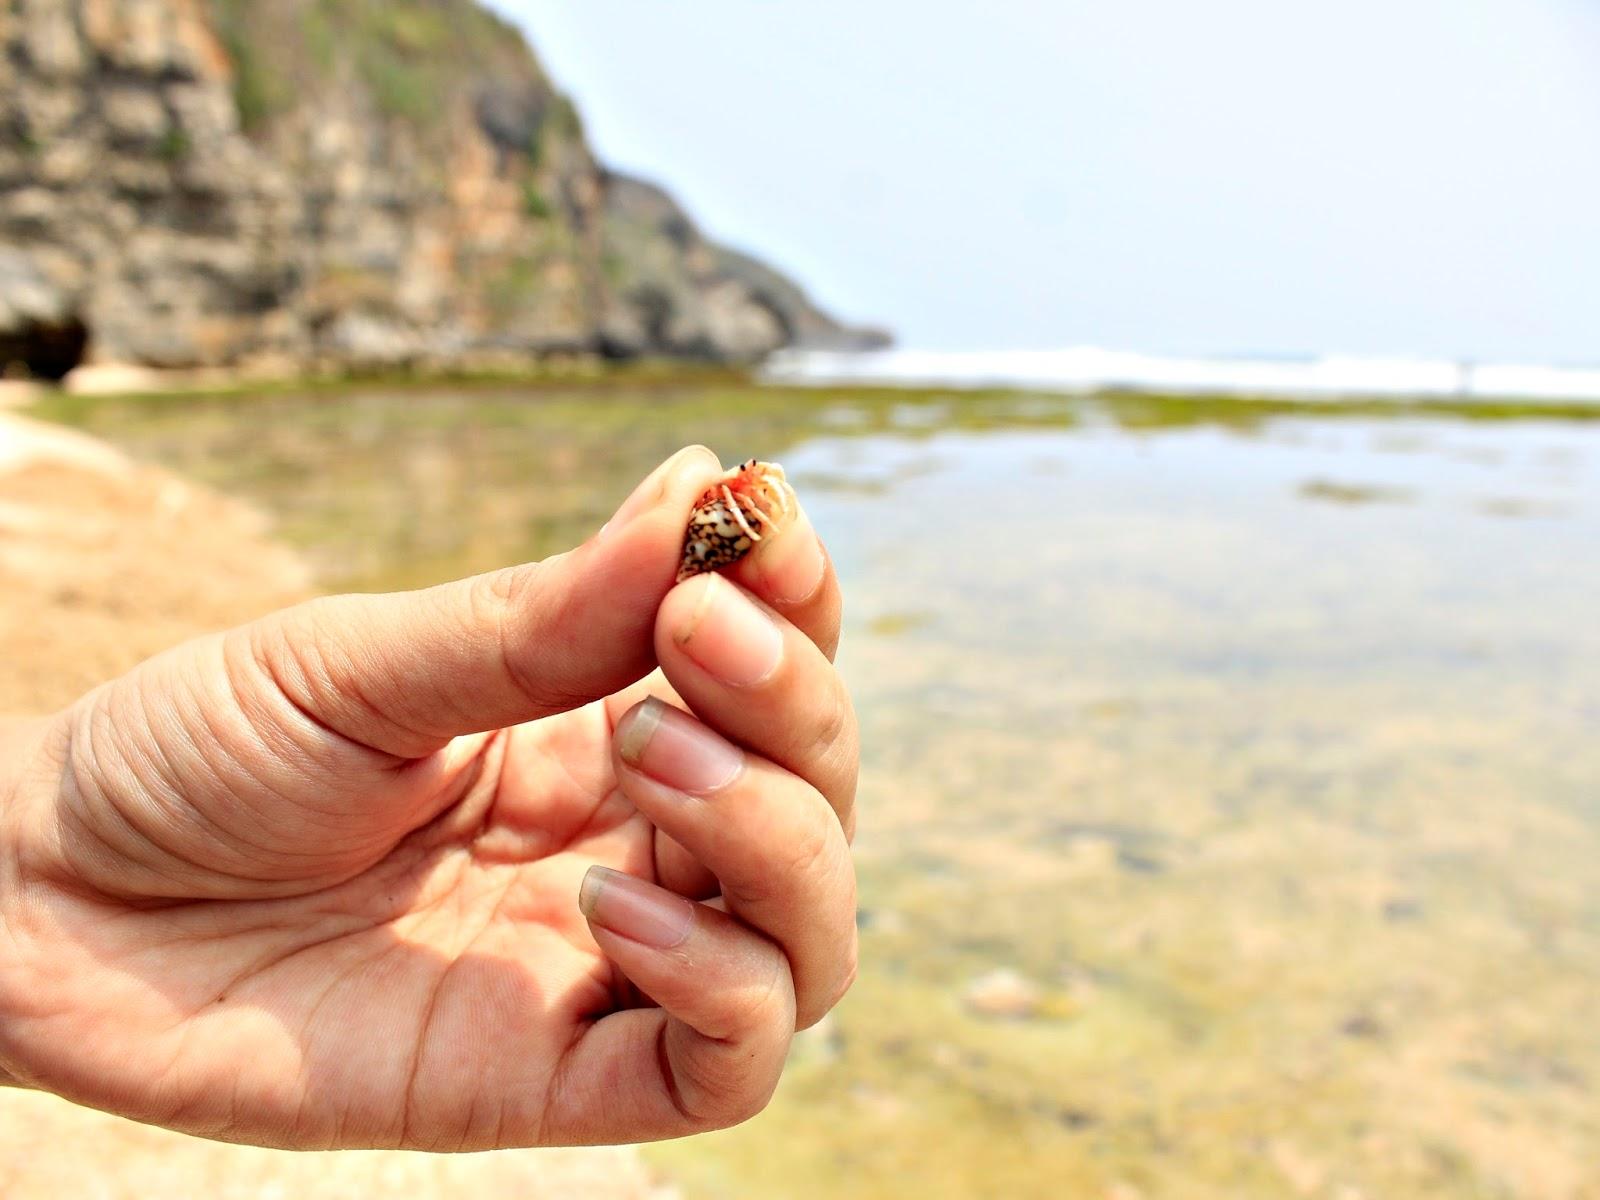 umang-umang kelomang pong-pongan pantai ngrumput gunungkidul yogyakarta